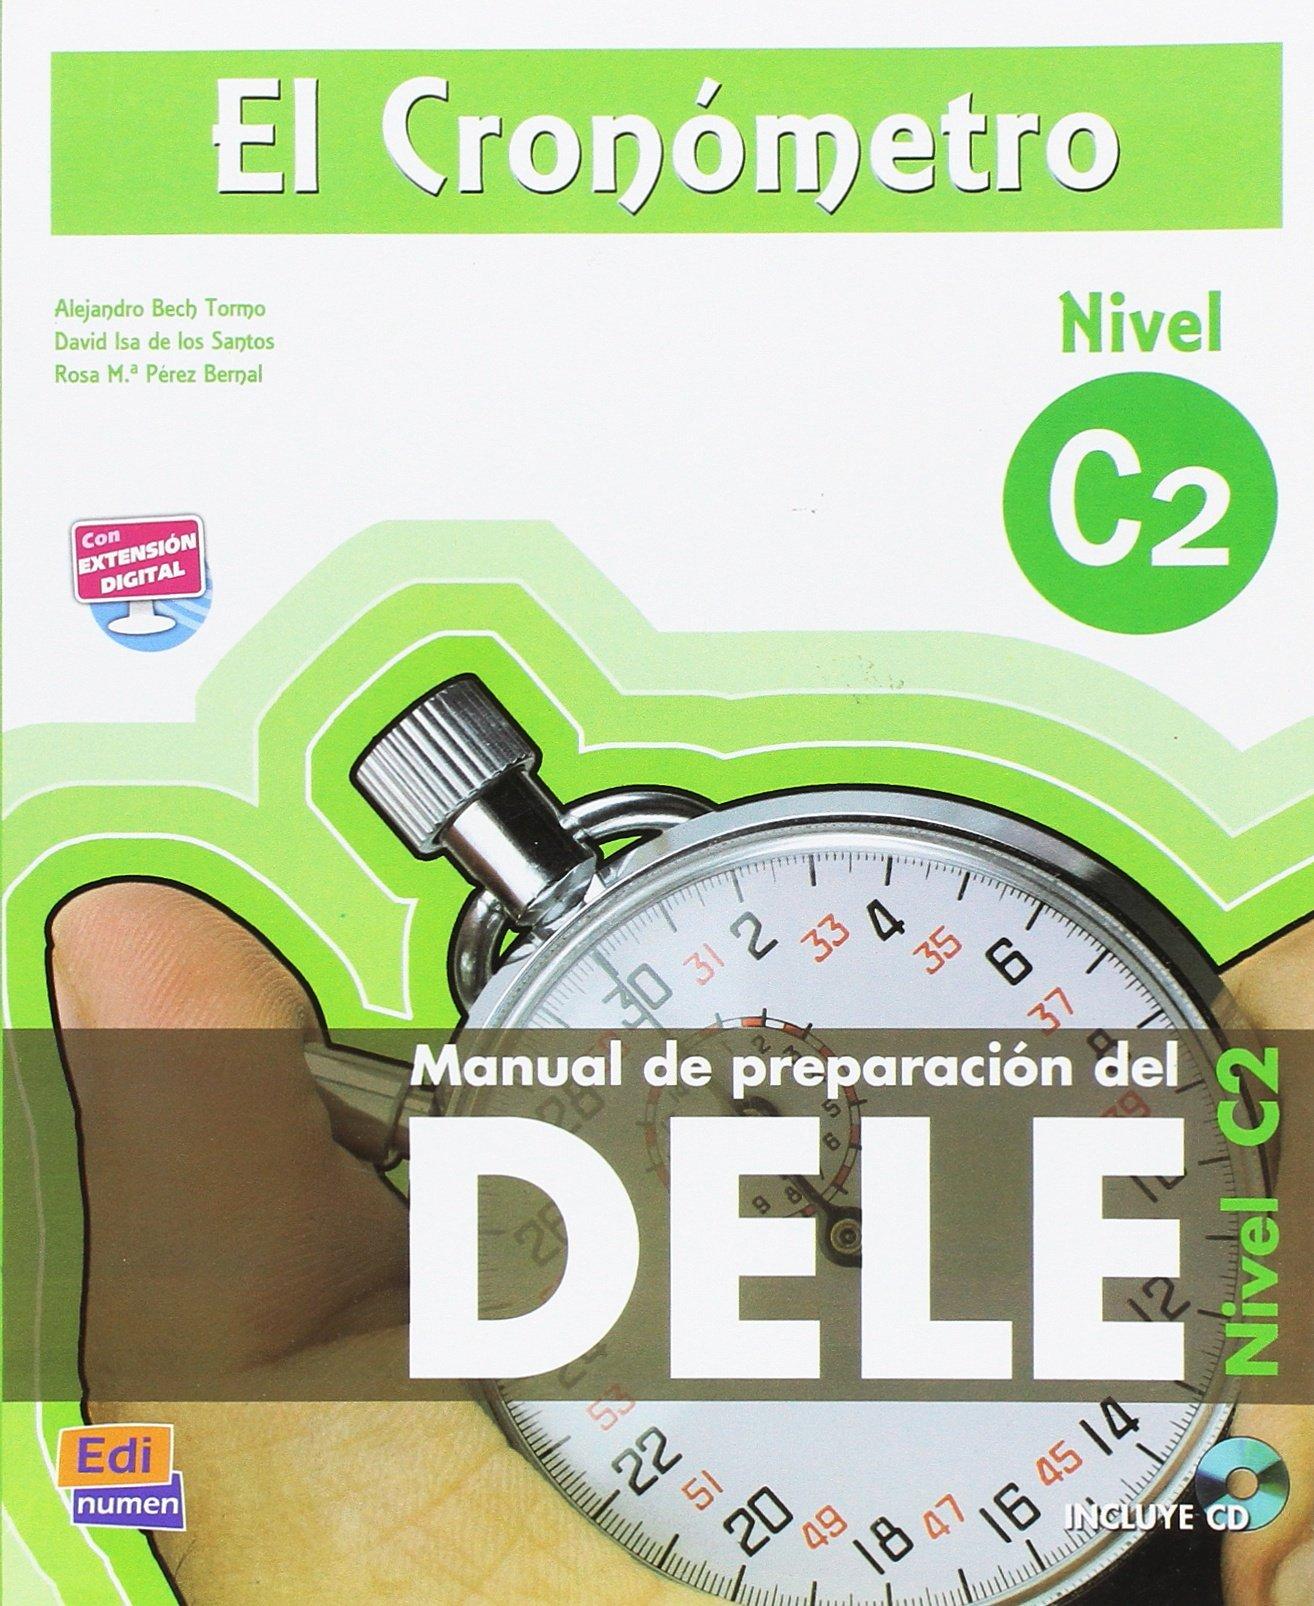 El cronometro / The Timer: Manual de preparacion del DELE. Nivel C2 (Superior) / DELE Preparation Manual. Level C2 (Superior) (Spanish Edition) (Spanish) ...